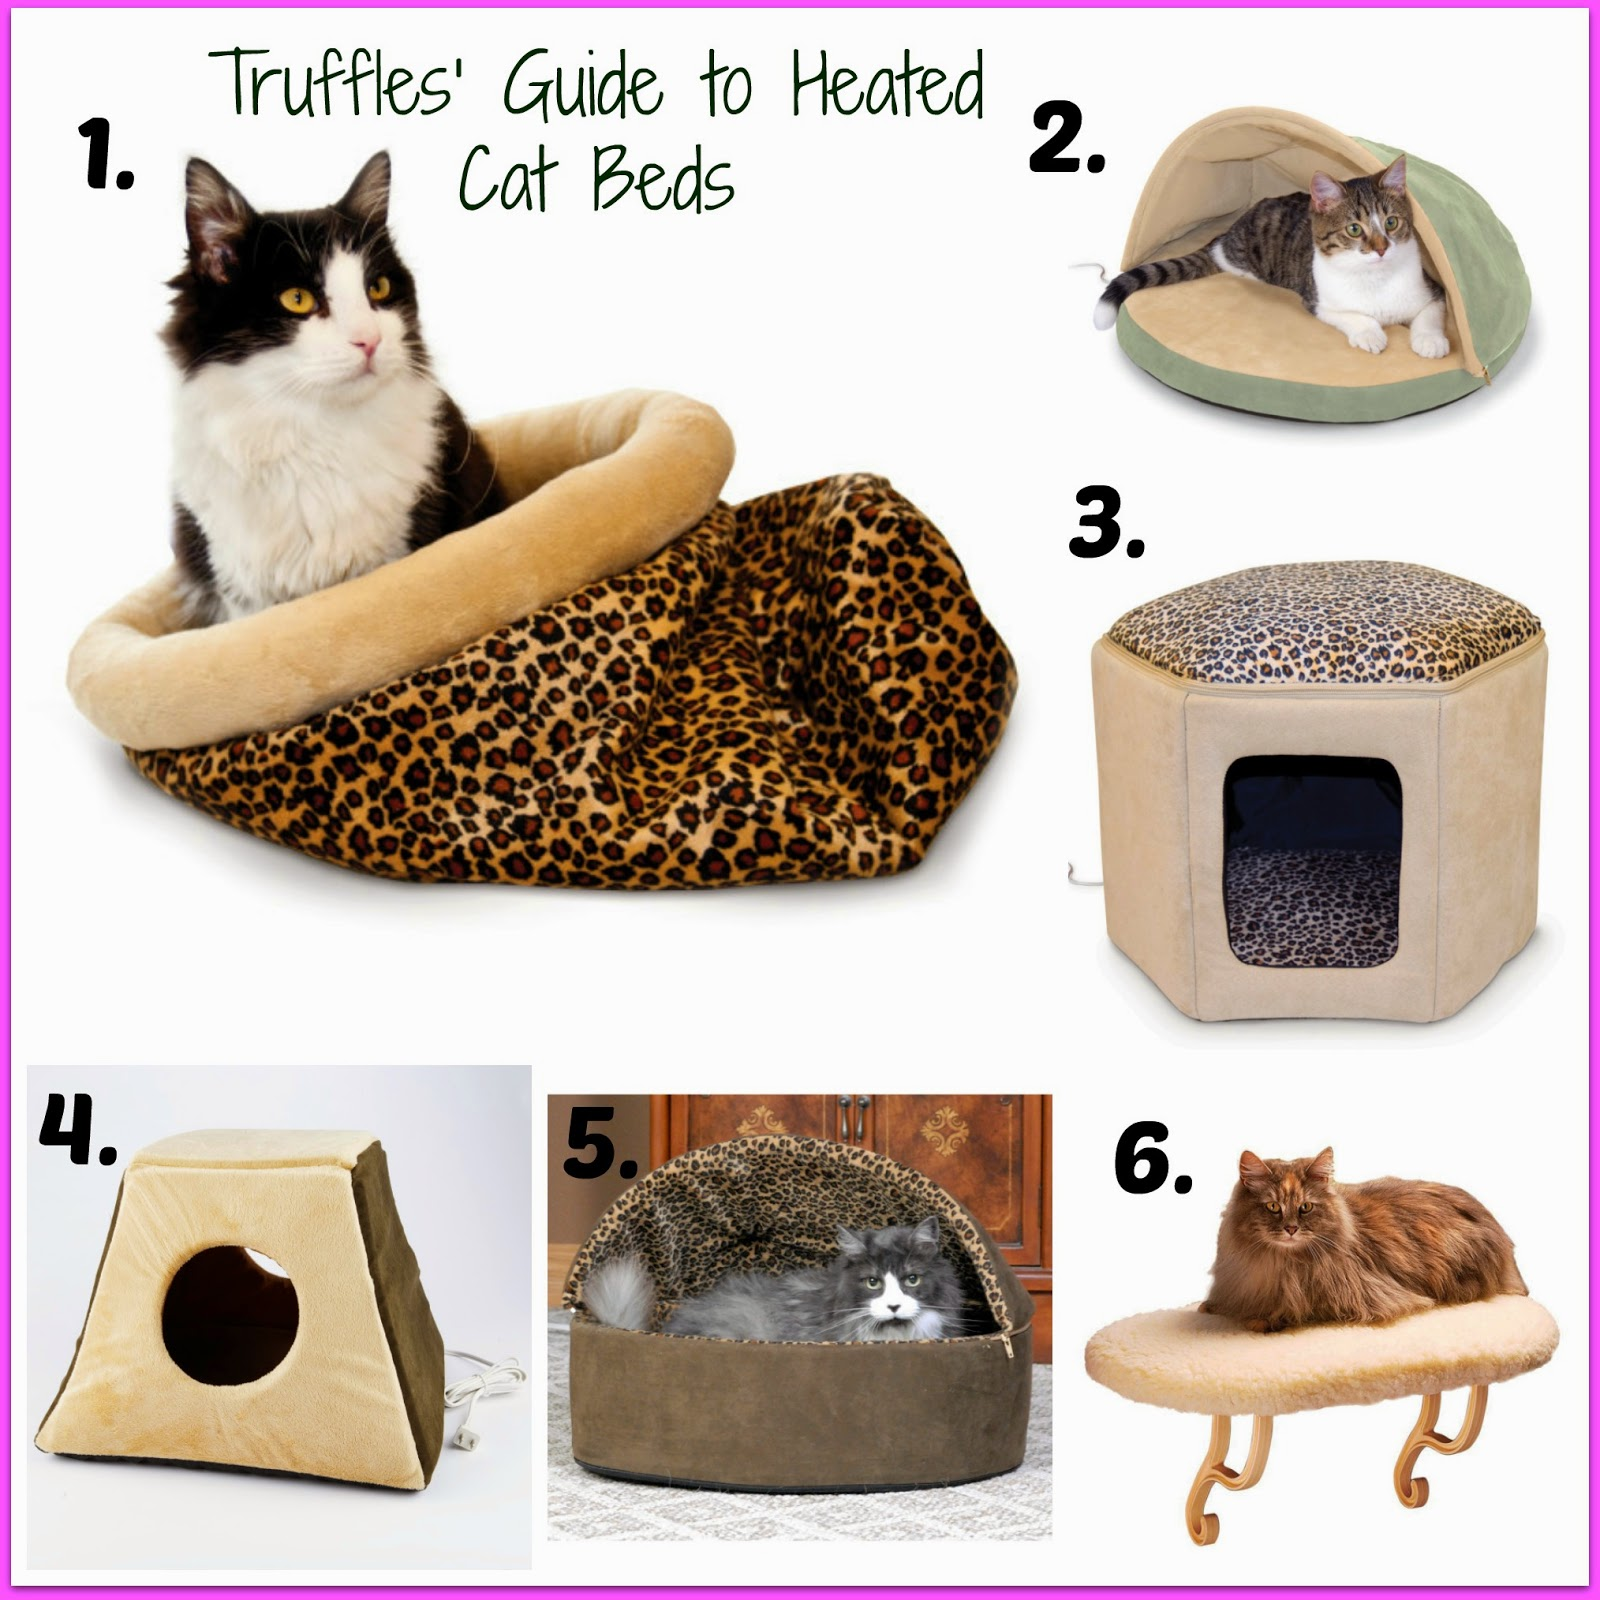 1 k u0026 h selfwarming kitty sack - Heated Pet Beds